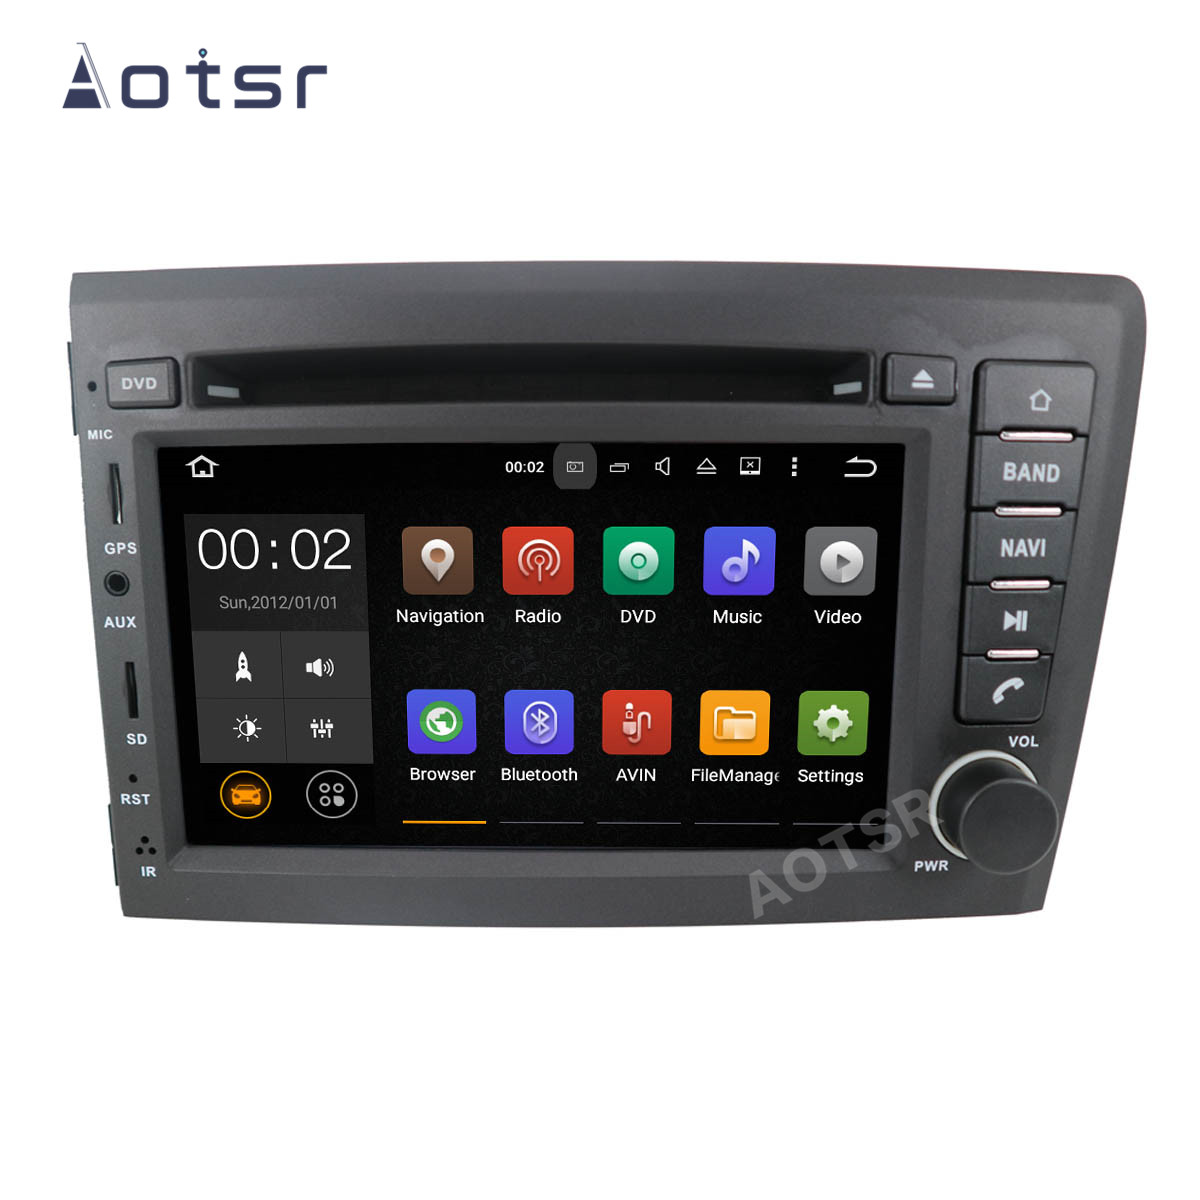 AOTSR Autoradio 2 Din Coche Android 9 Pour VOLVO S60 V70 XC70 XC90 2000 2001 2002 2003 2004 GPS Navigation 2Din Autoradio